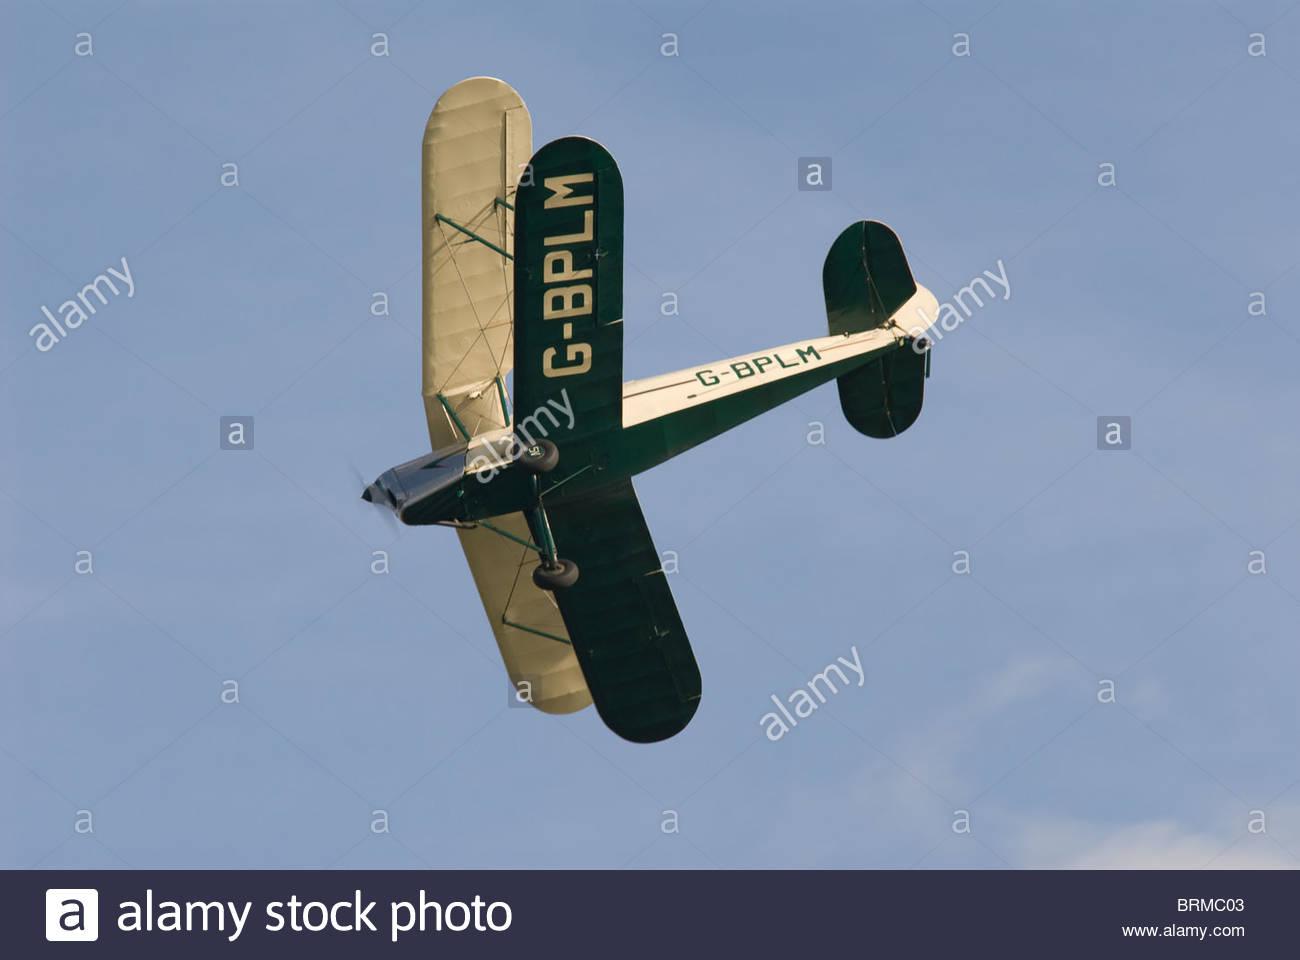 Tiger Moth Bi- plane and headcorn aerodrome in Kent - Stock Image